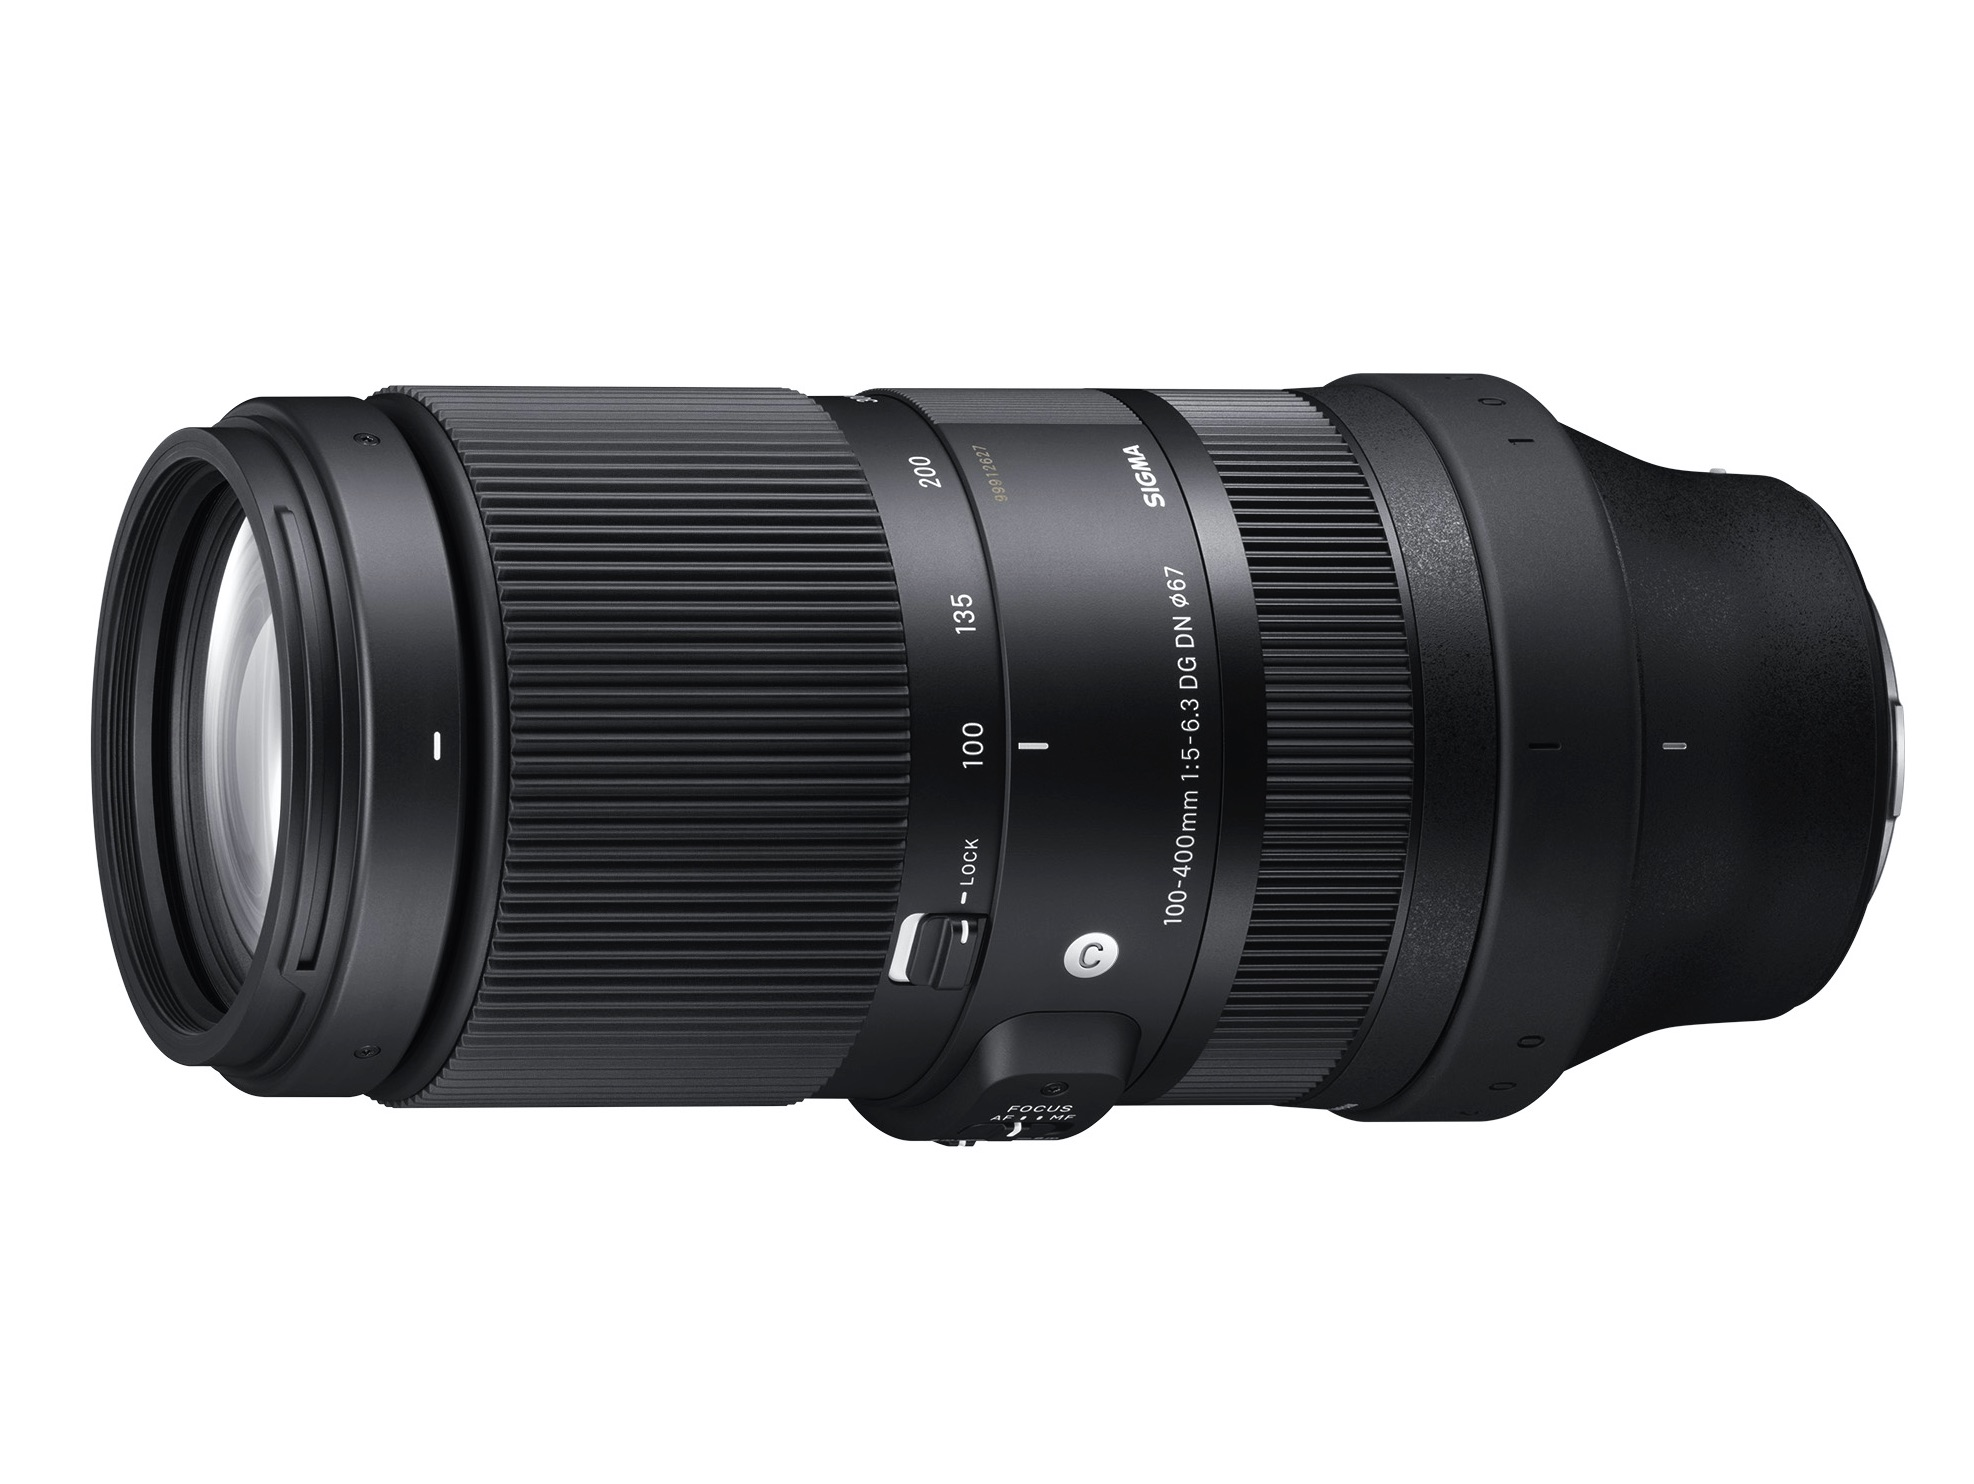 Sigma Announces 100-400mm F5-6.3 DG DN OS Contemporary